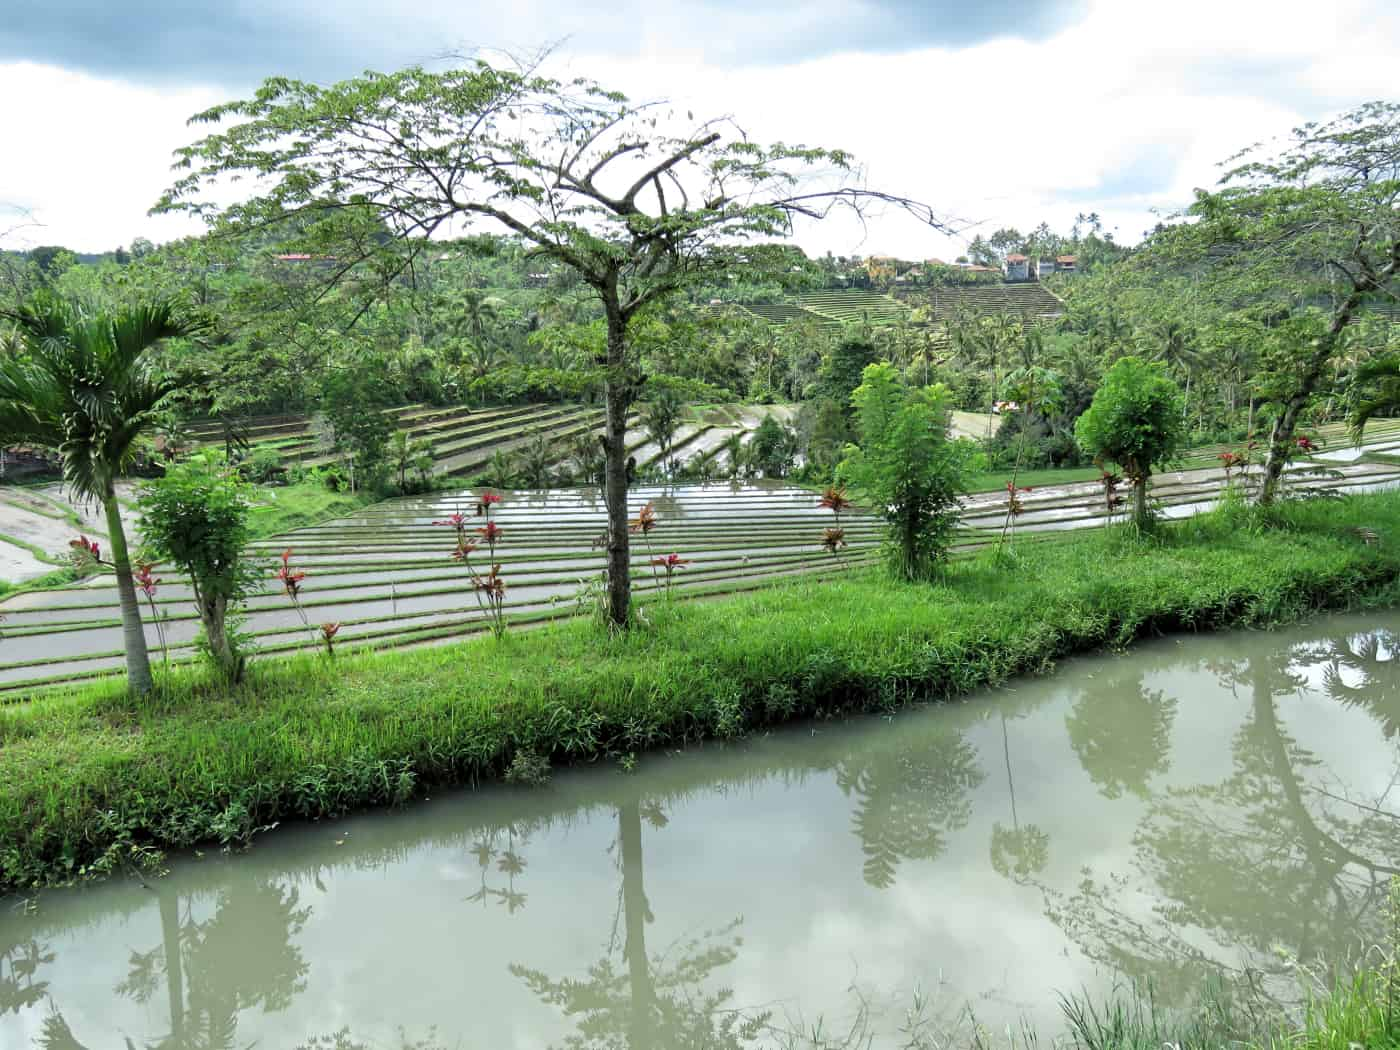 gogirlrun_bali_indonesien_privatetour_norden_reisterassen_tabanan_38